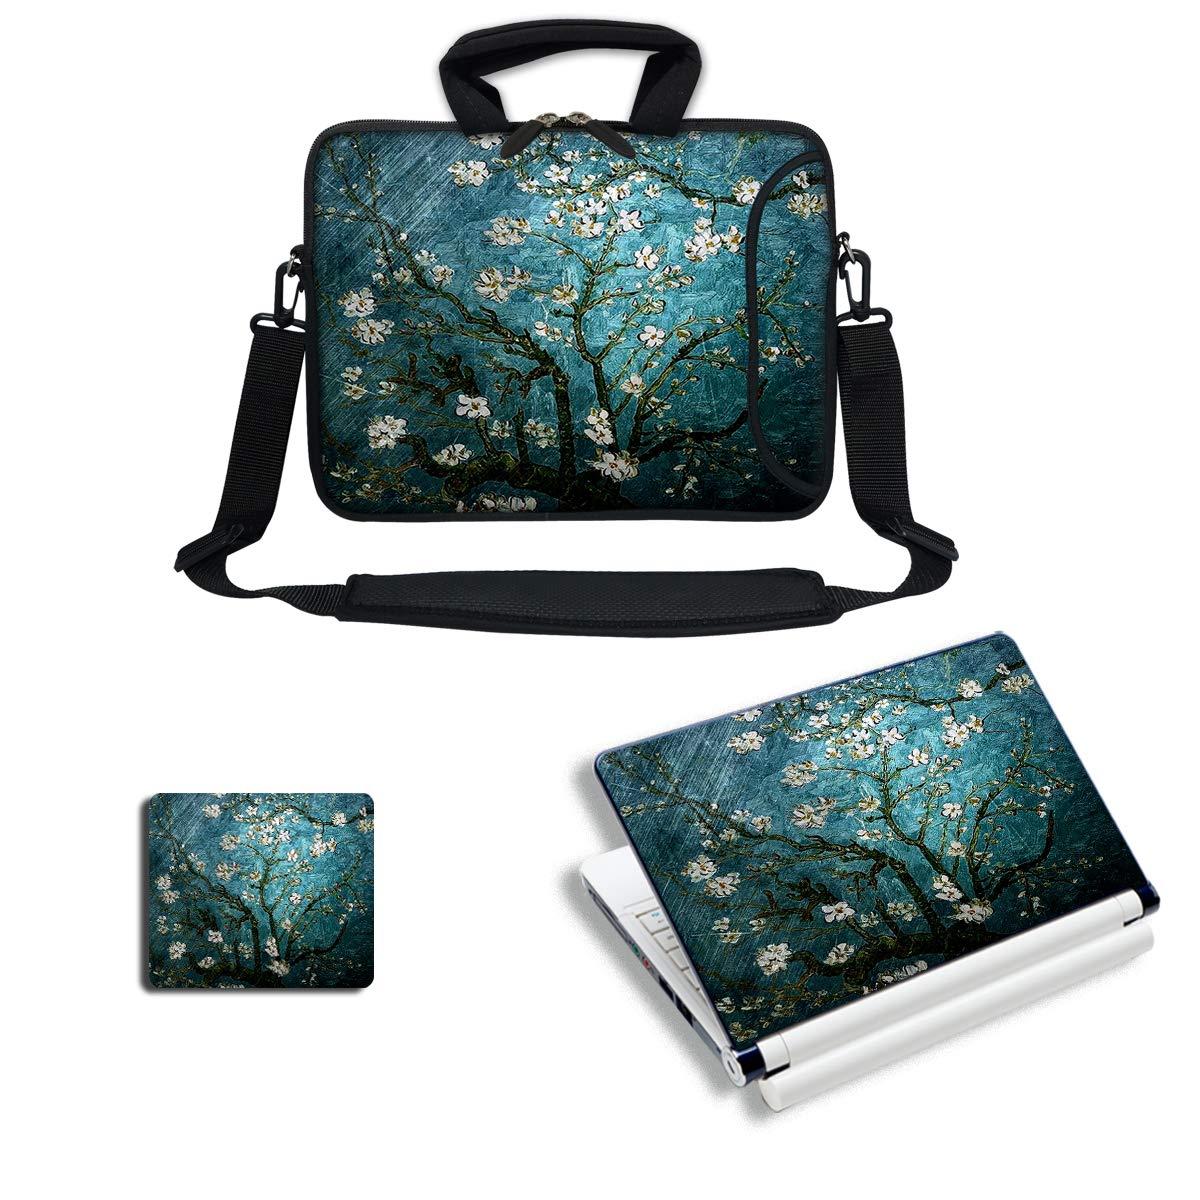 Meffort Inc Laptop Bundle Deal - Includes Neoprene Laptop Bag with Side Pocket Adjust Shoulder Strap with Matching Skin Sticker Decal & Mouse Pad (13.3 Inch, Almond Blossoming)